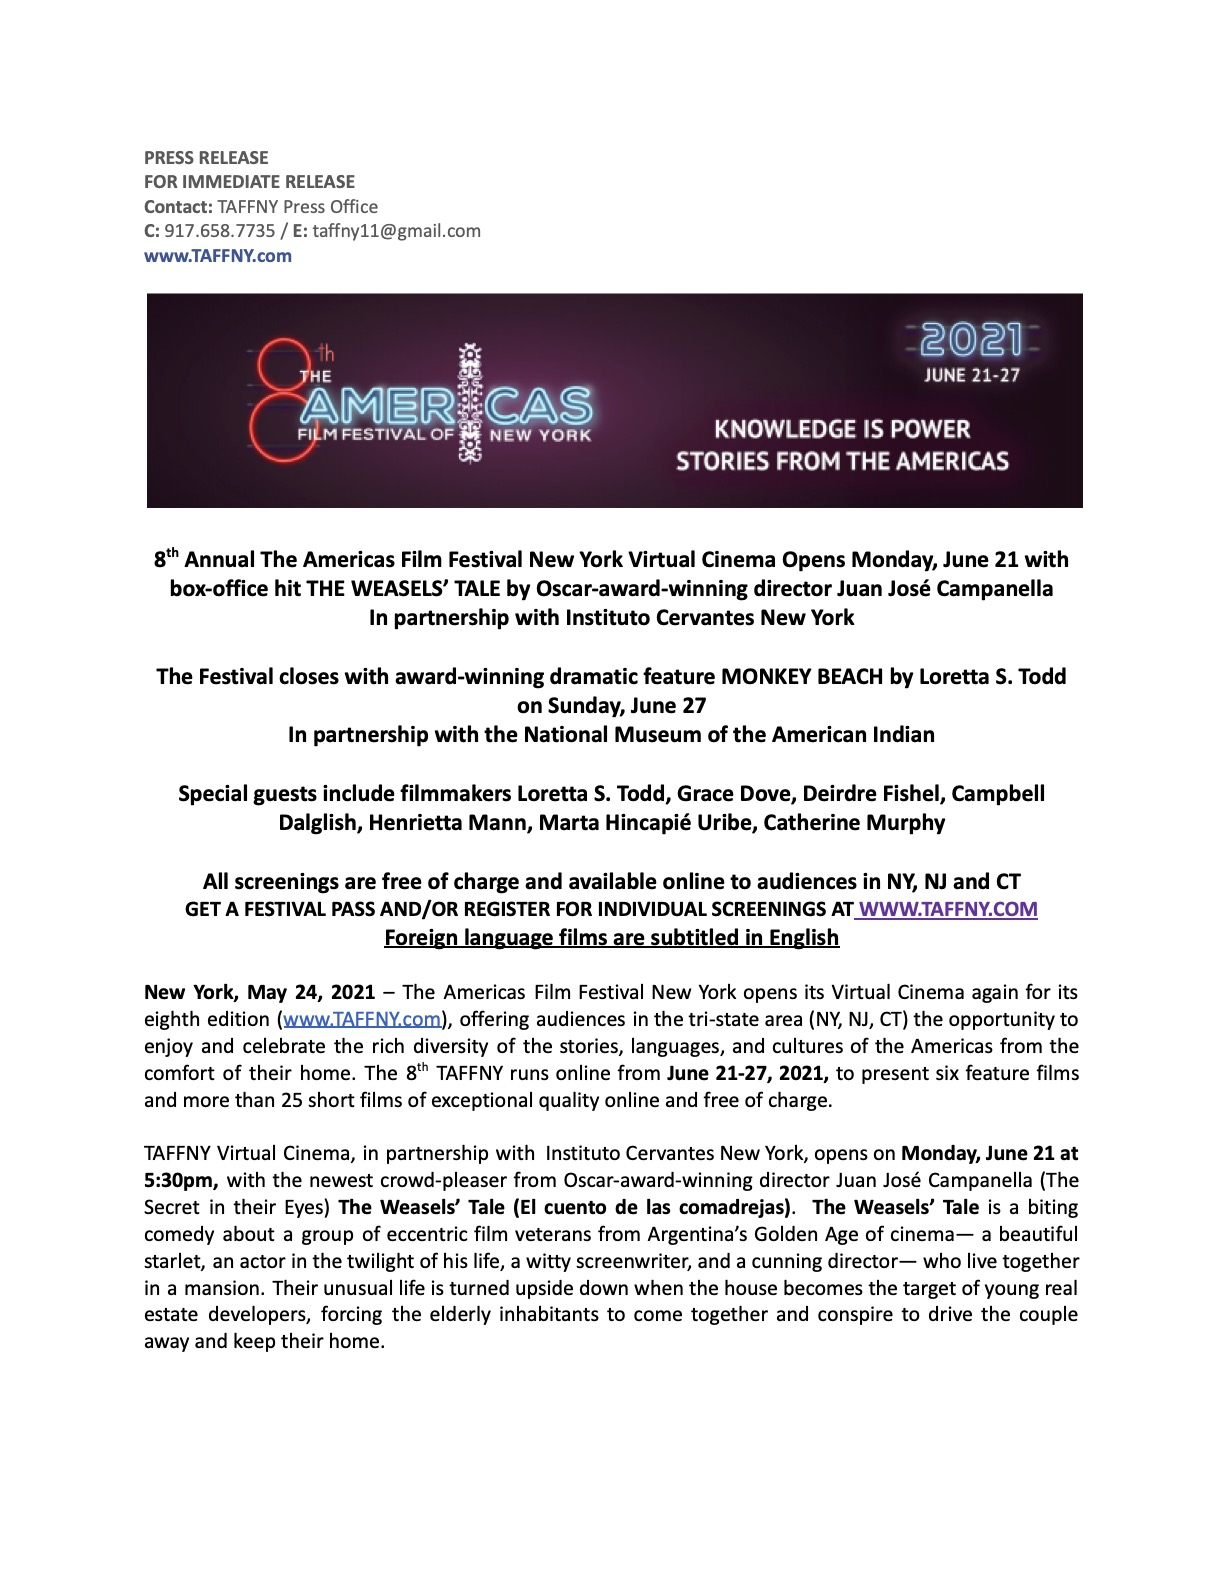 TAFFNY21 Press Release - ENG